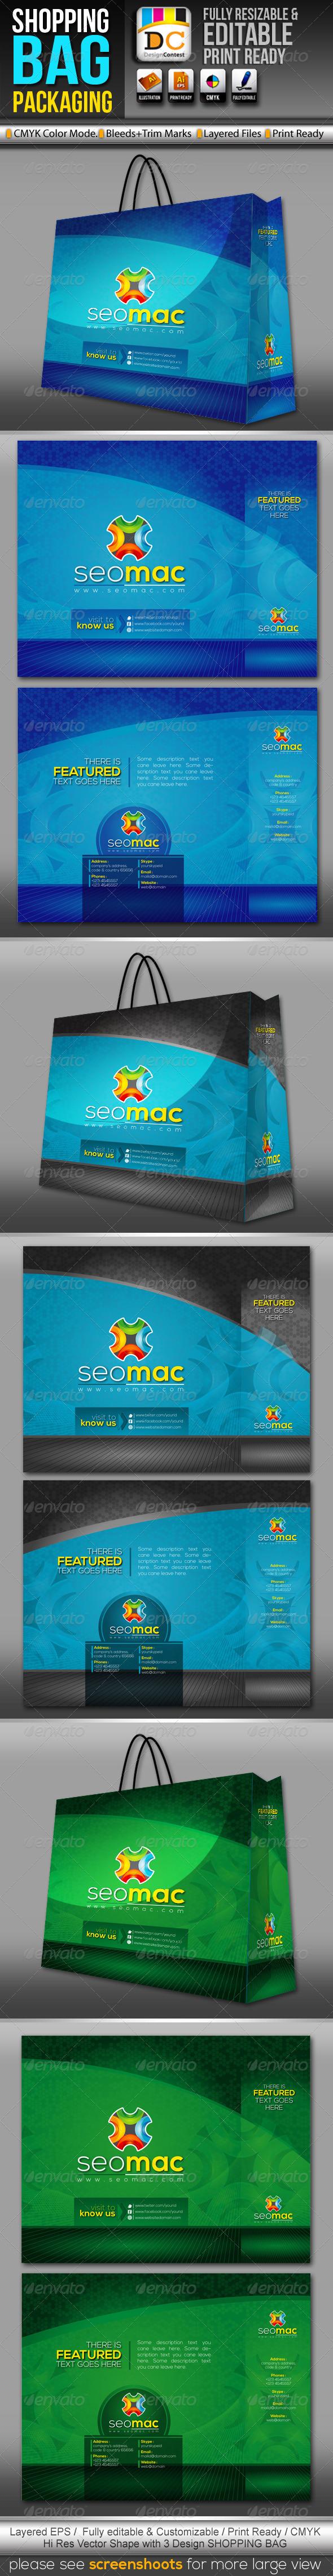 SeoMac Shopping Bag Packaging  - Packaging Print Templates